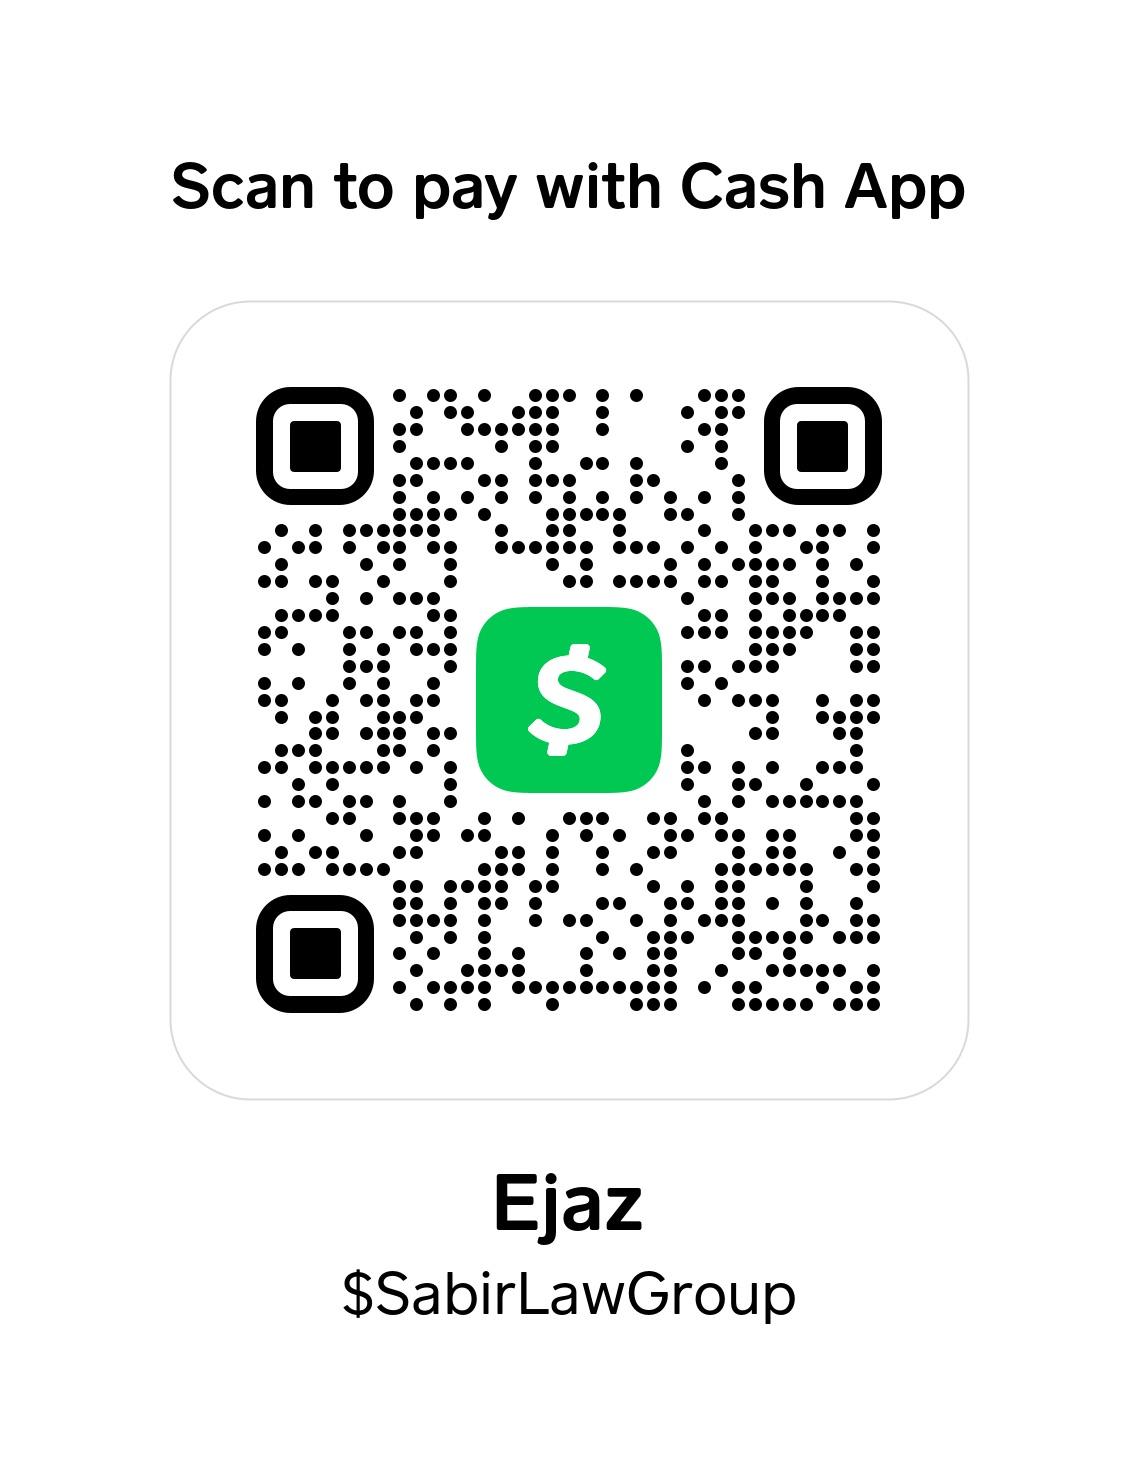 Cash APP QR code